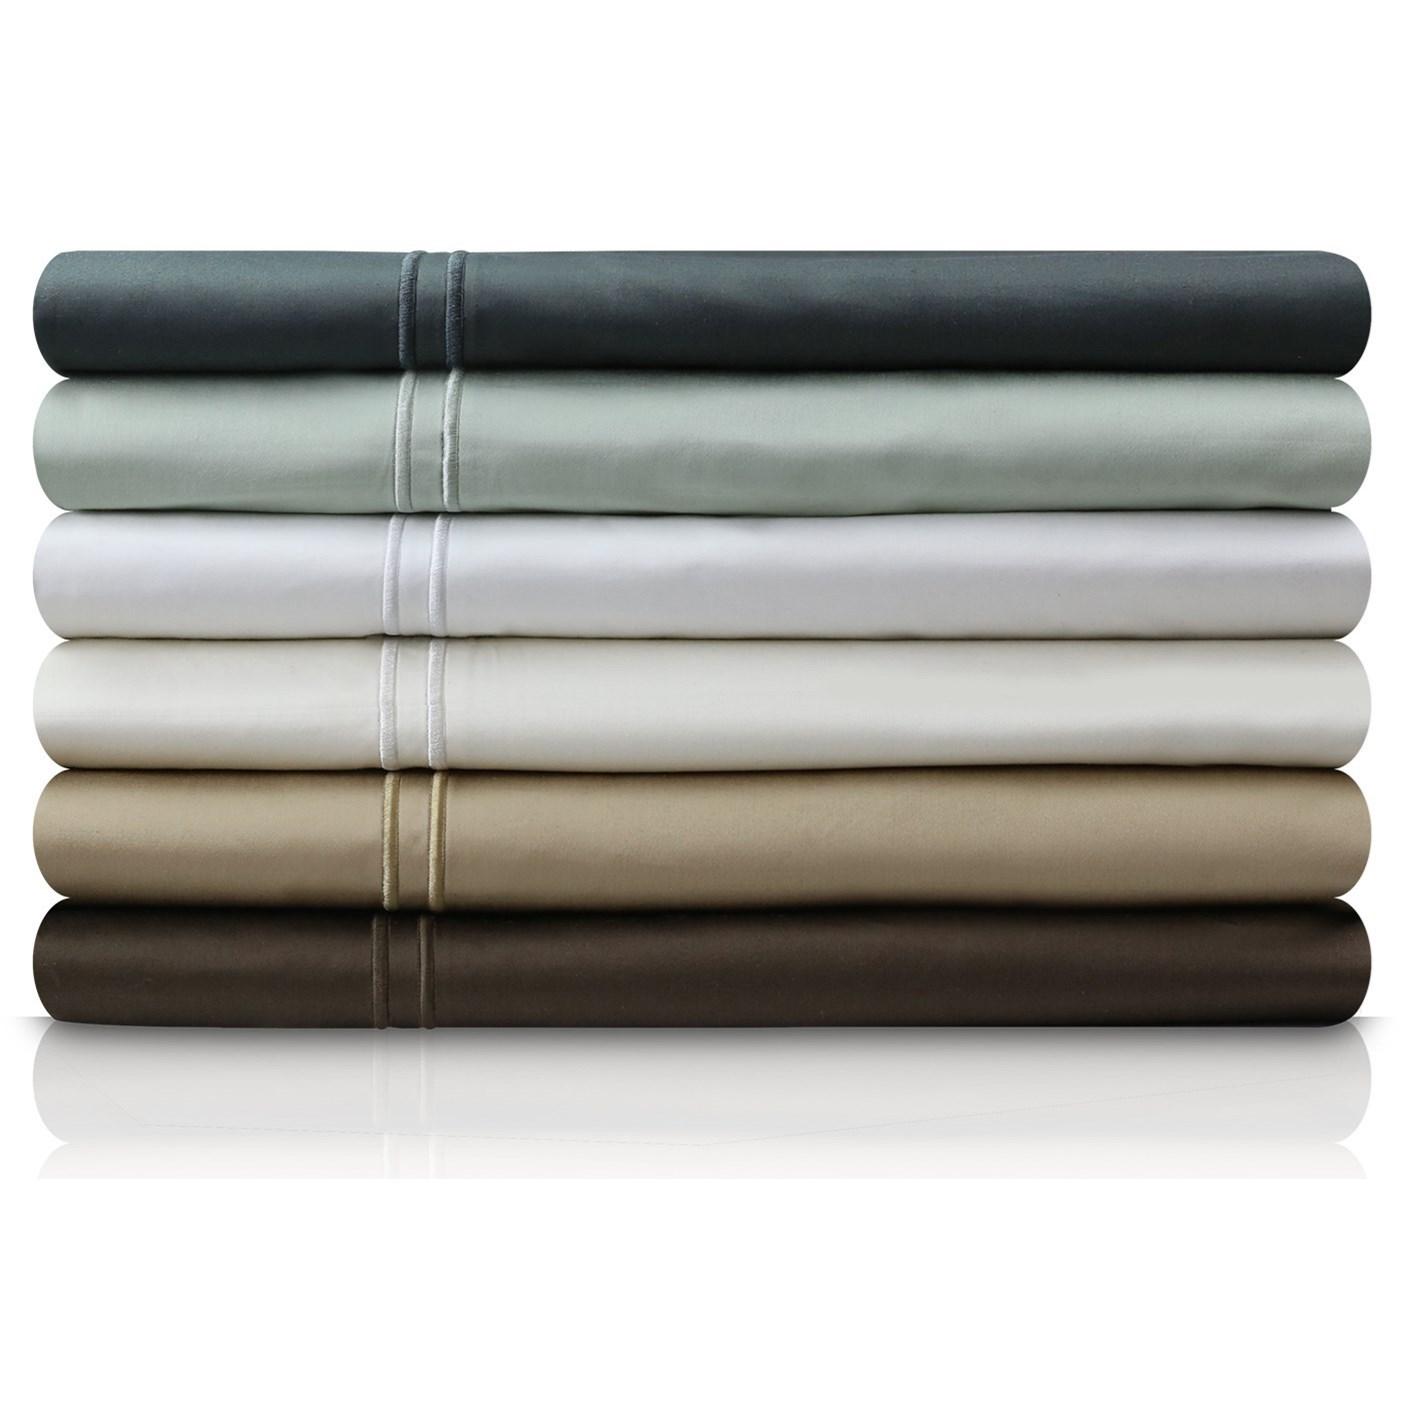 Malouf Egyptian Cotton King 600 TC Egyptian Cotton Sheet Set - Item Number: MA06KKWHSS